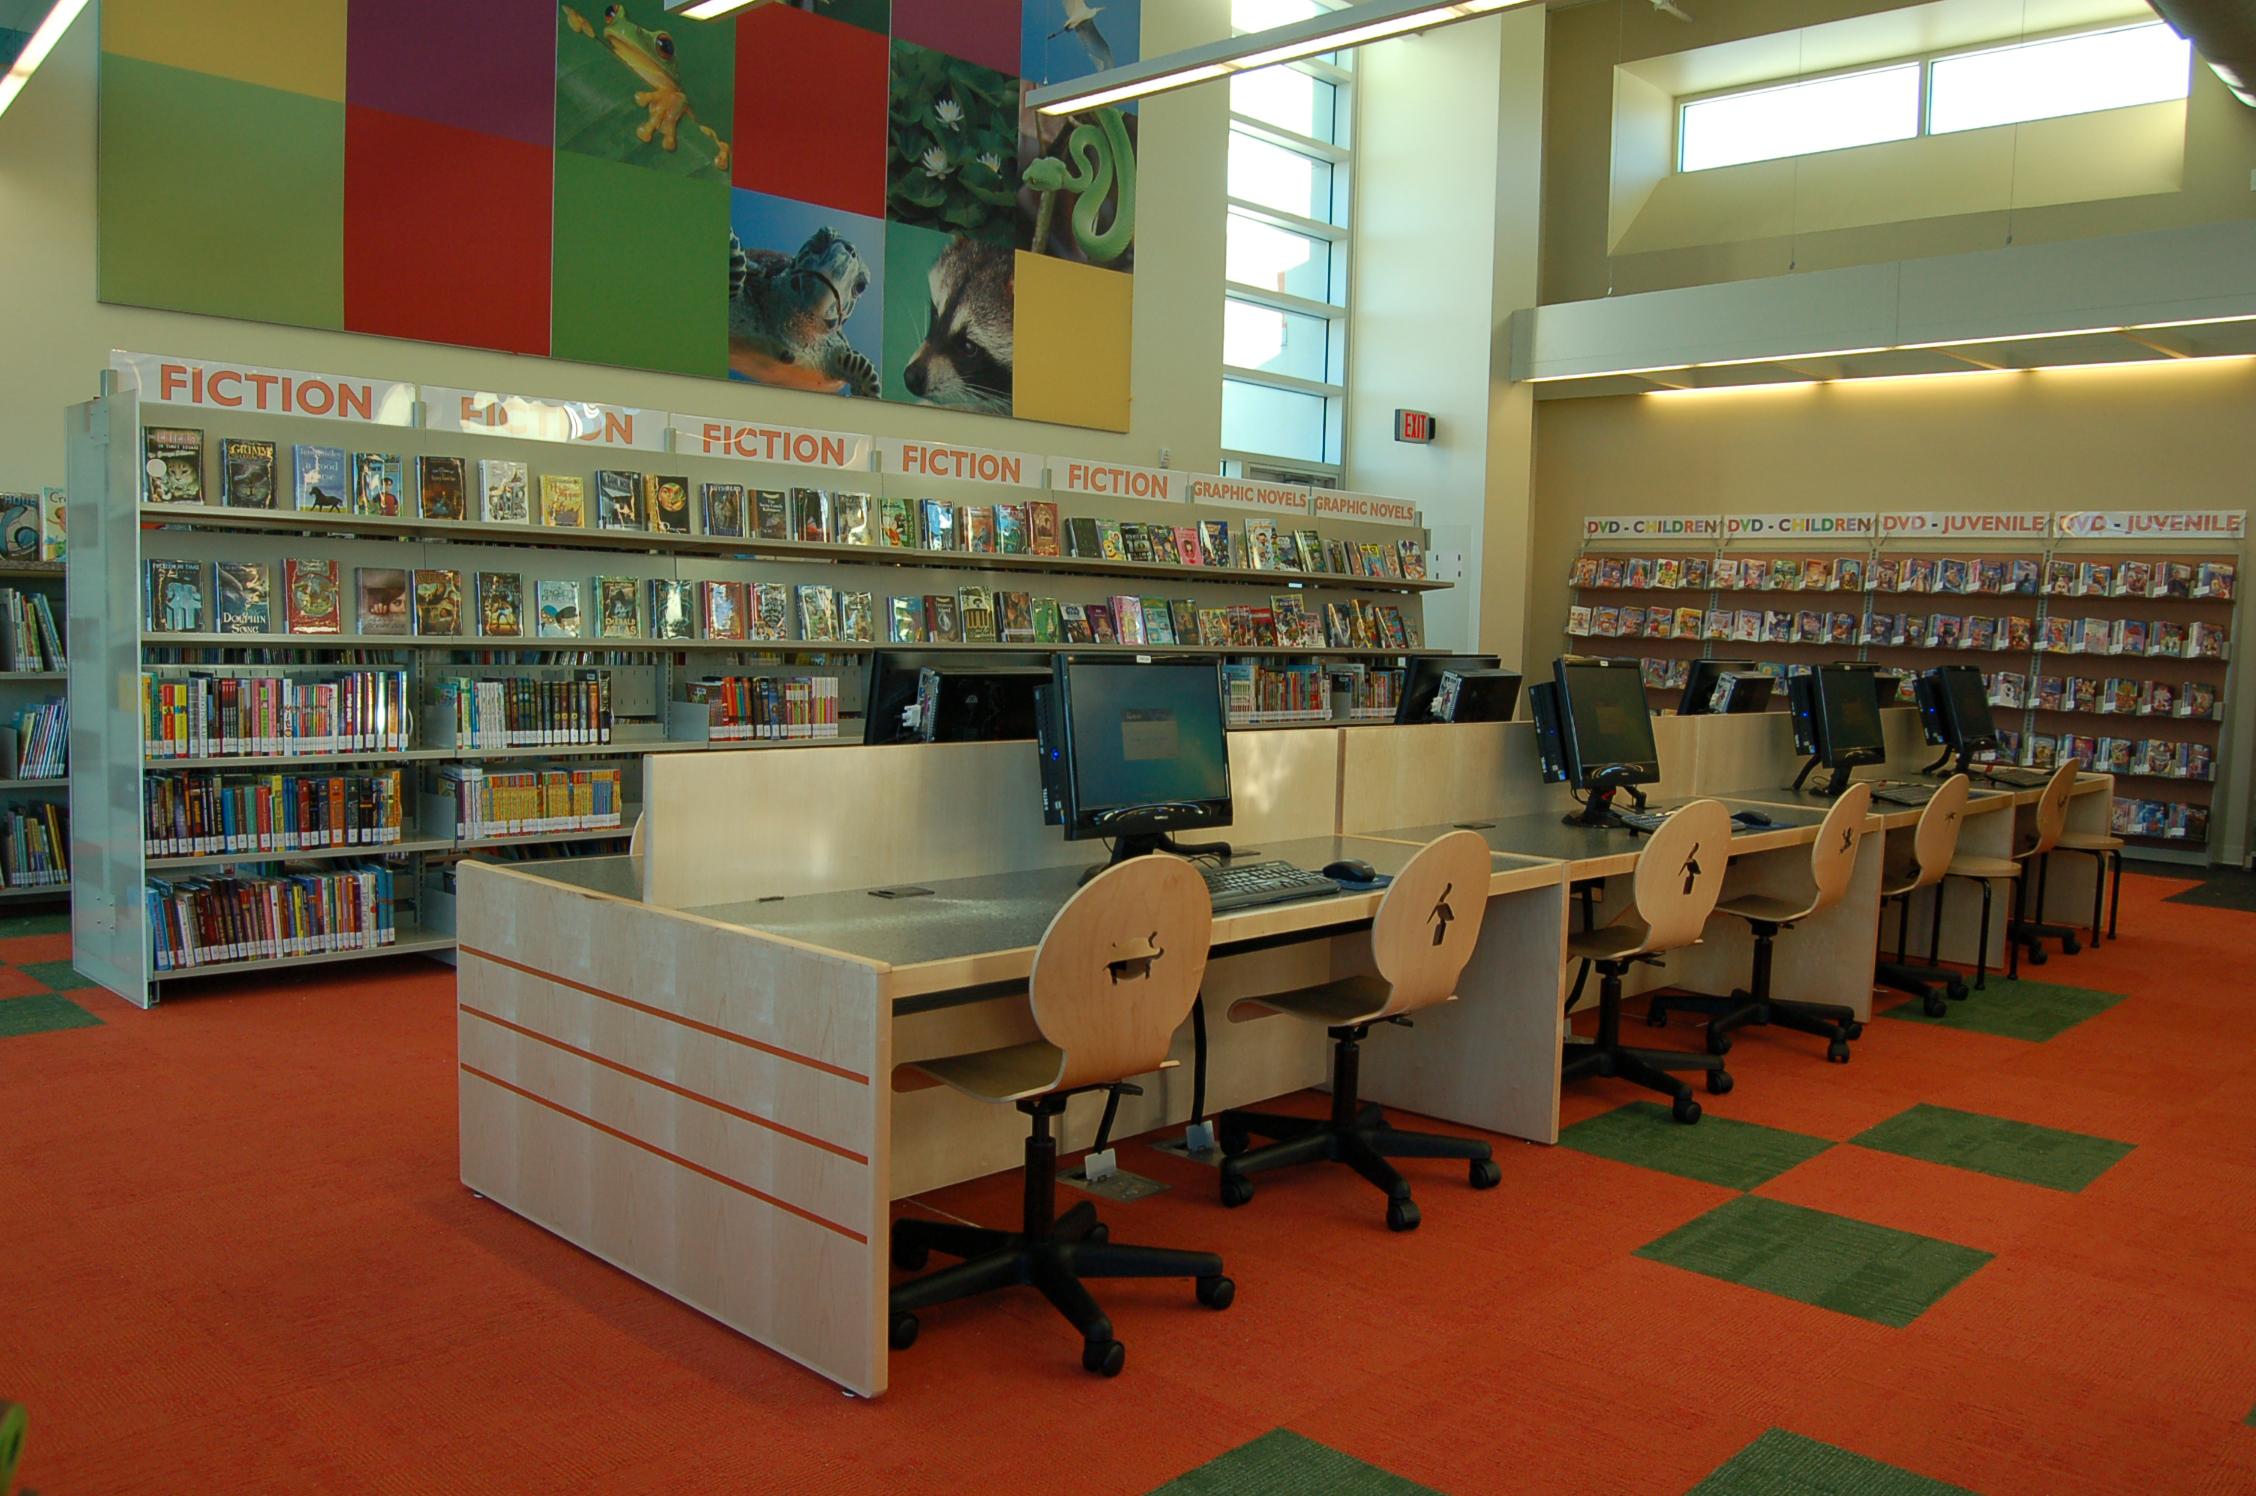 Lakeshore Branch Library - Metairie, LA